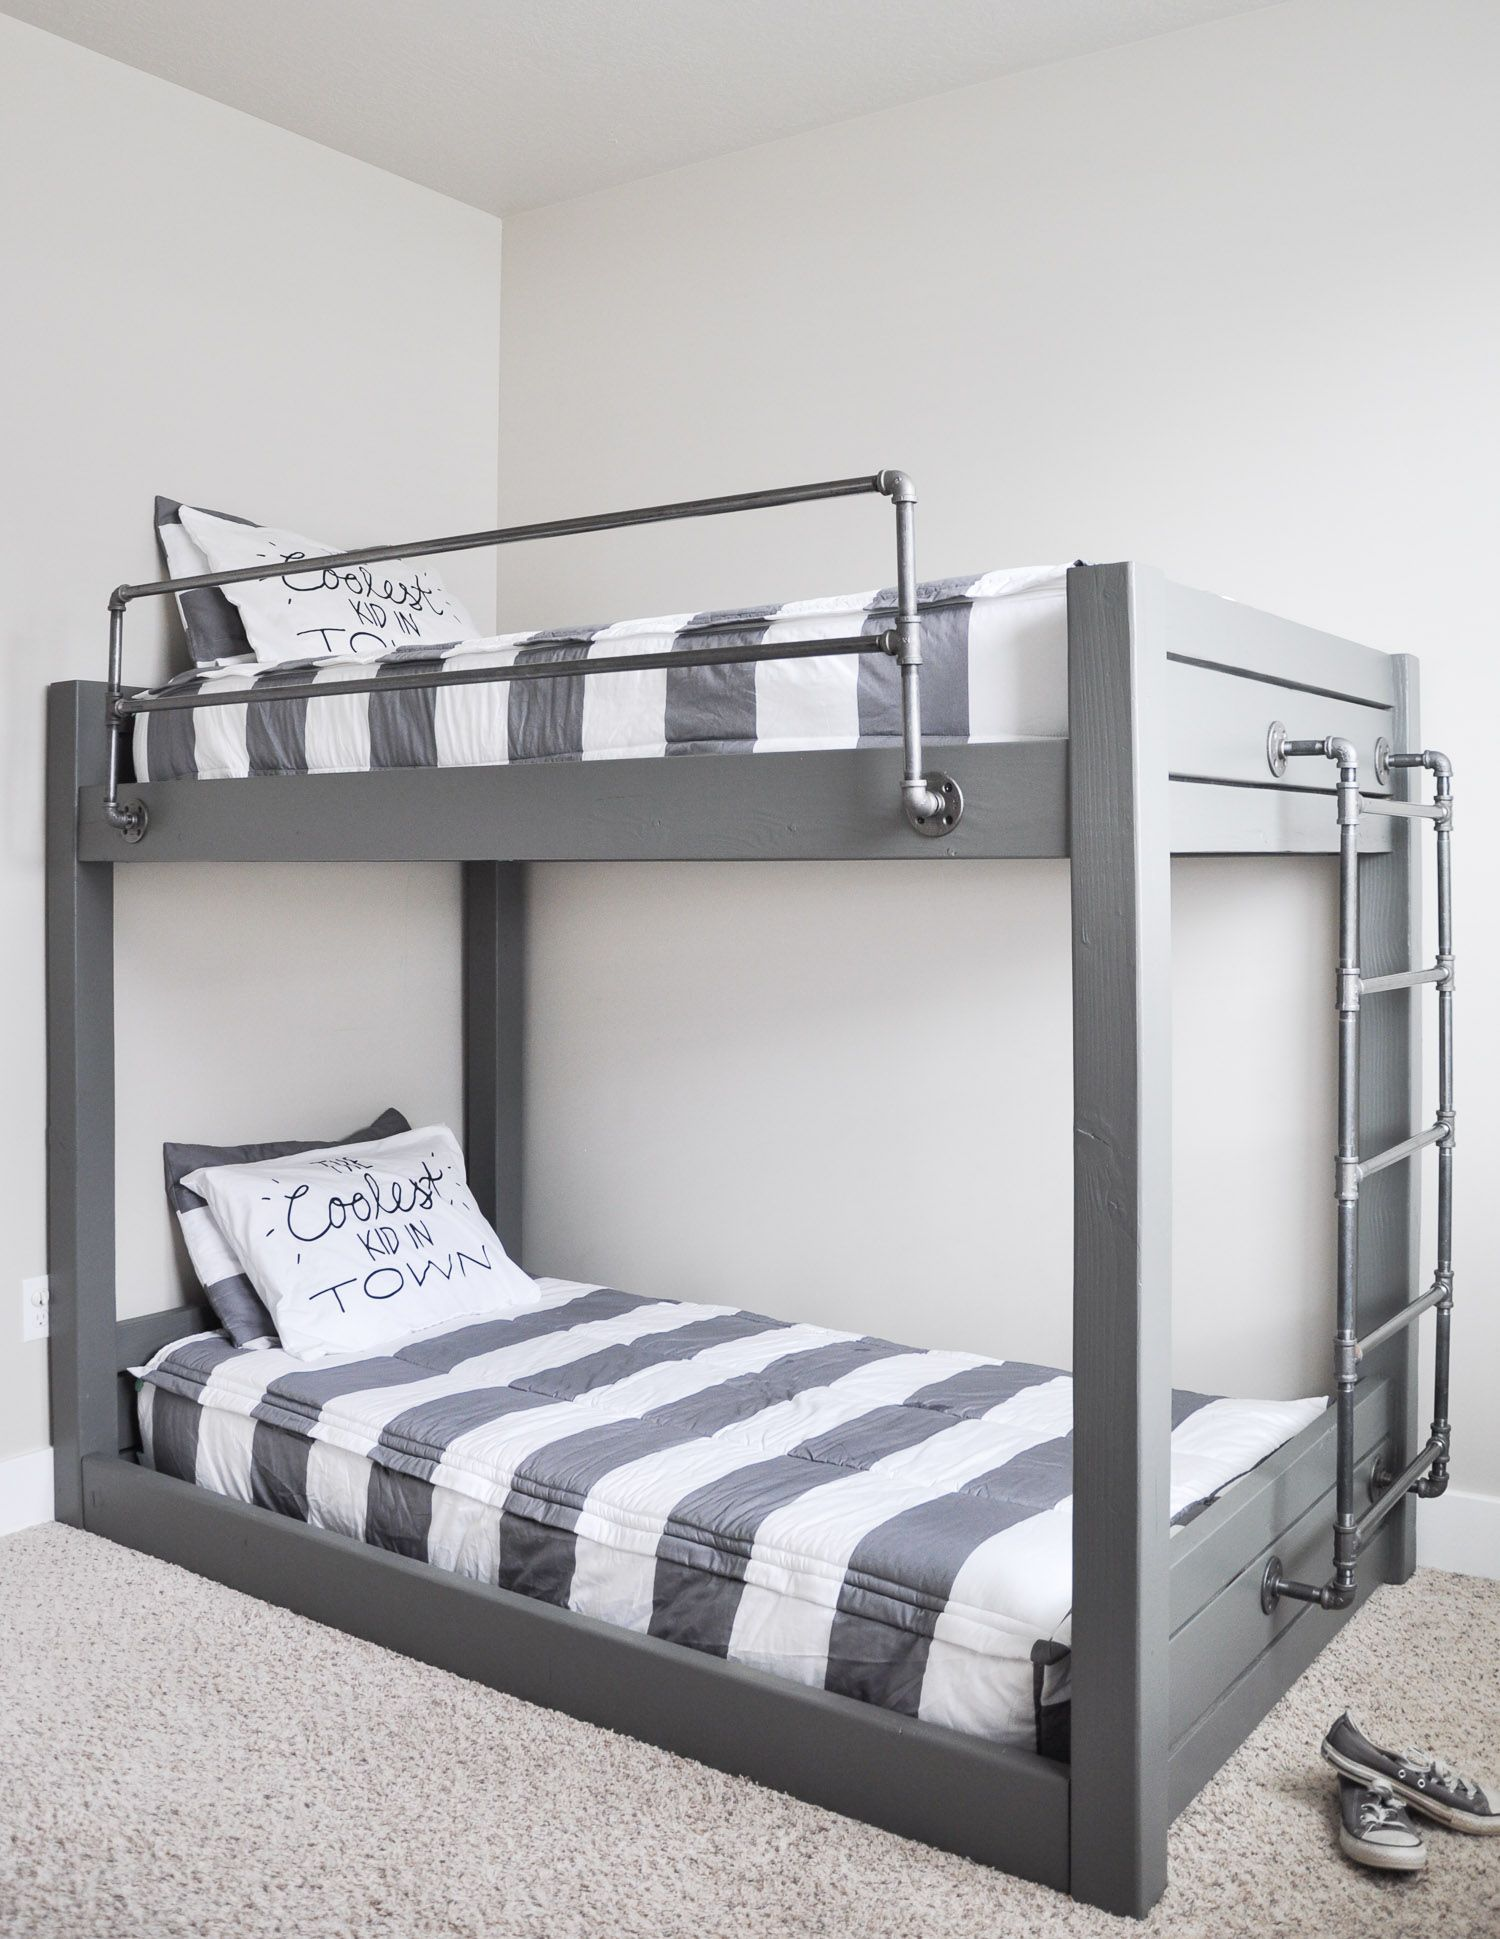 30+ Amazing bunk beds design ideas #TripleBunkBeds #Bedroom #BunkBeds #HomeDecor #HomeDesign #Child #Kids #InteriorDesign #HomeInterior